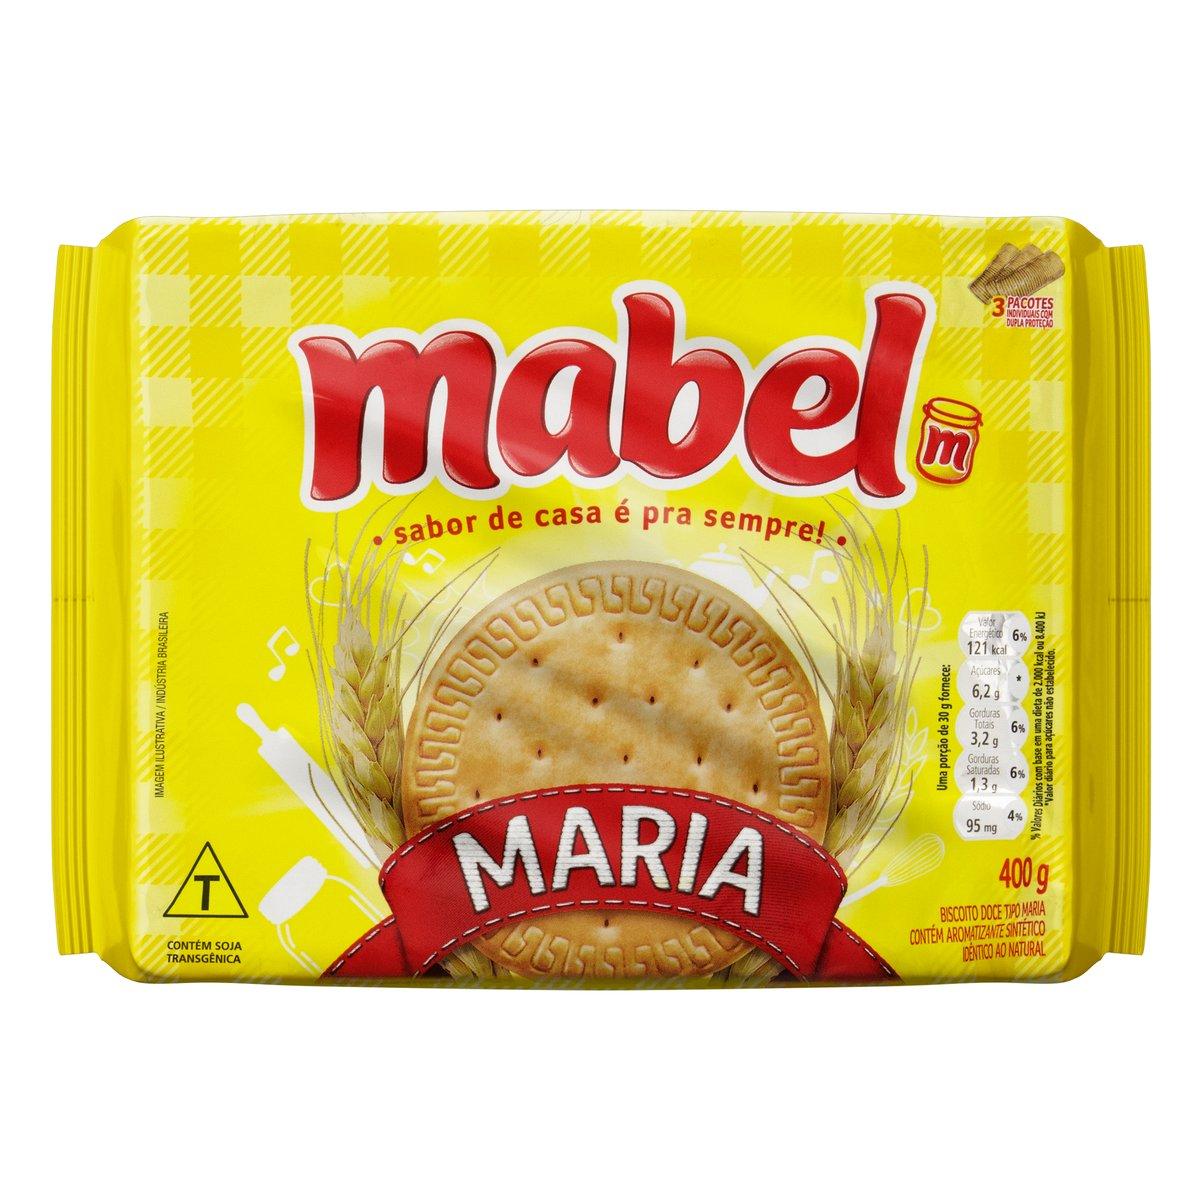 Biscoito Maria Mabel Pacote 400g 3 Unidades